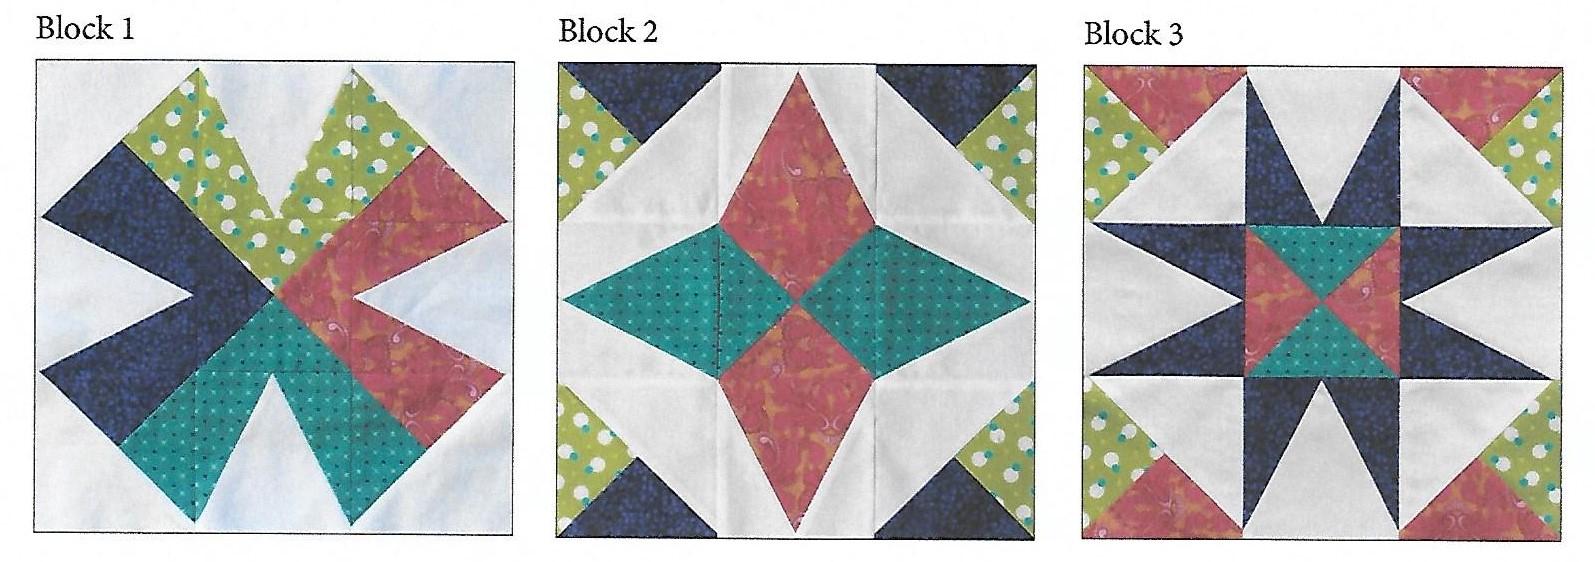 BlockBuster 9 blocks